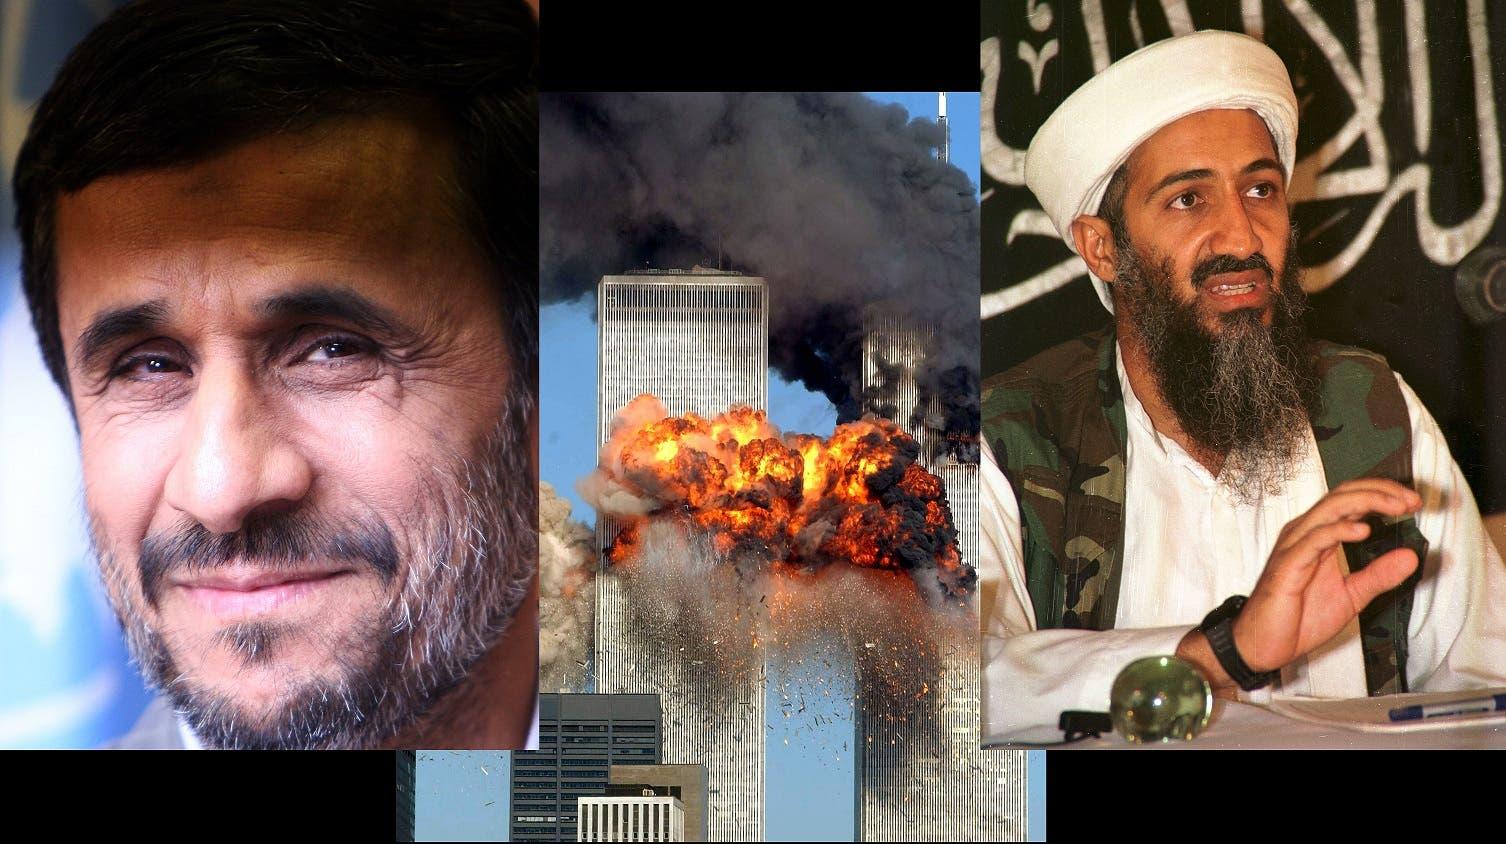 Al-Qaeda bash Ahmadinejad's 'conspiracy theories' using their very own 9/11 conspiracy theory.  Iran's Ahmadinejad has been considered King of the 9/11 conspiracy theories.